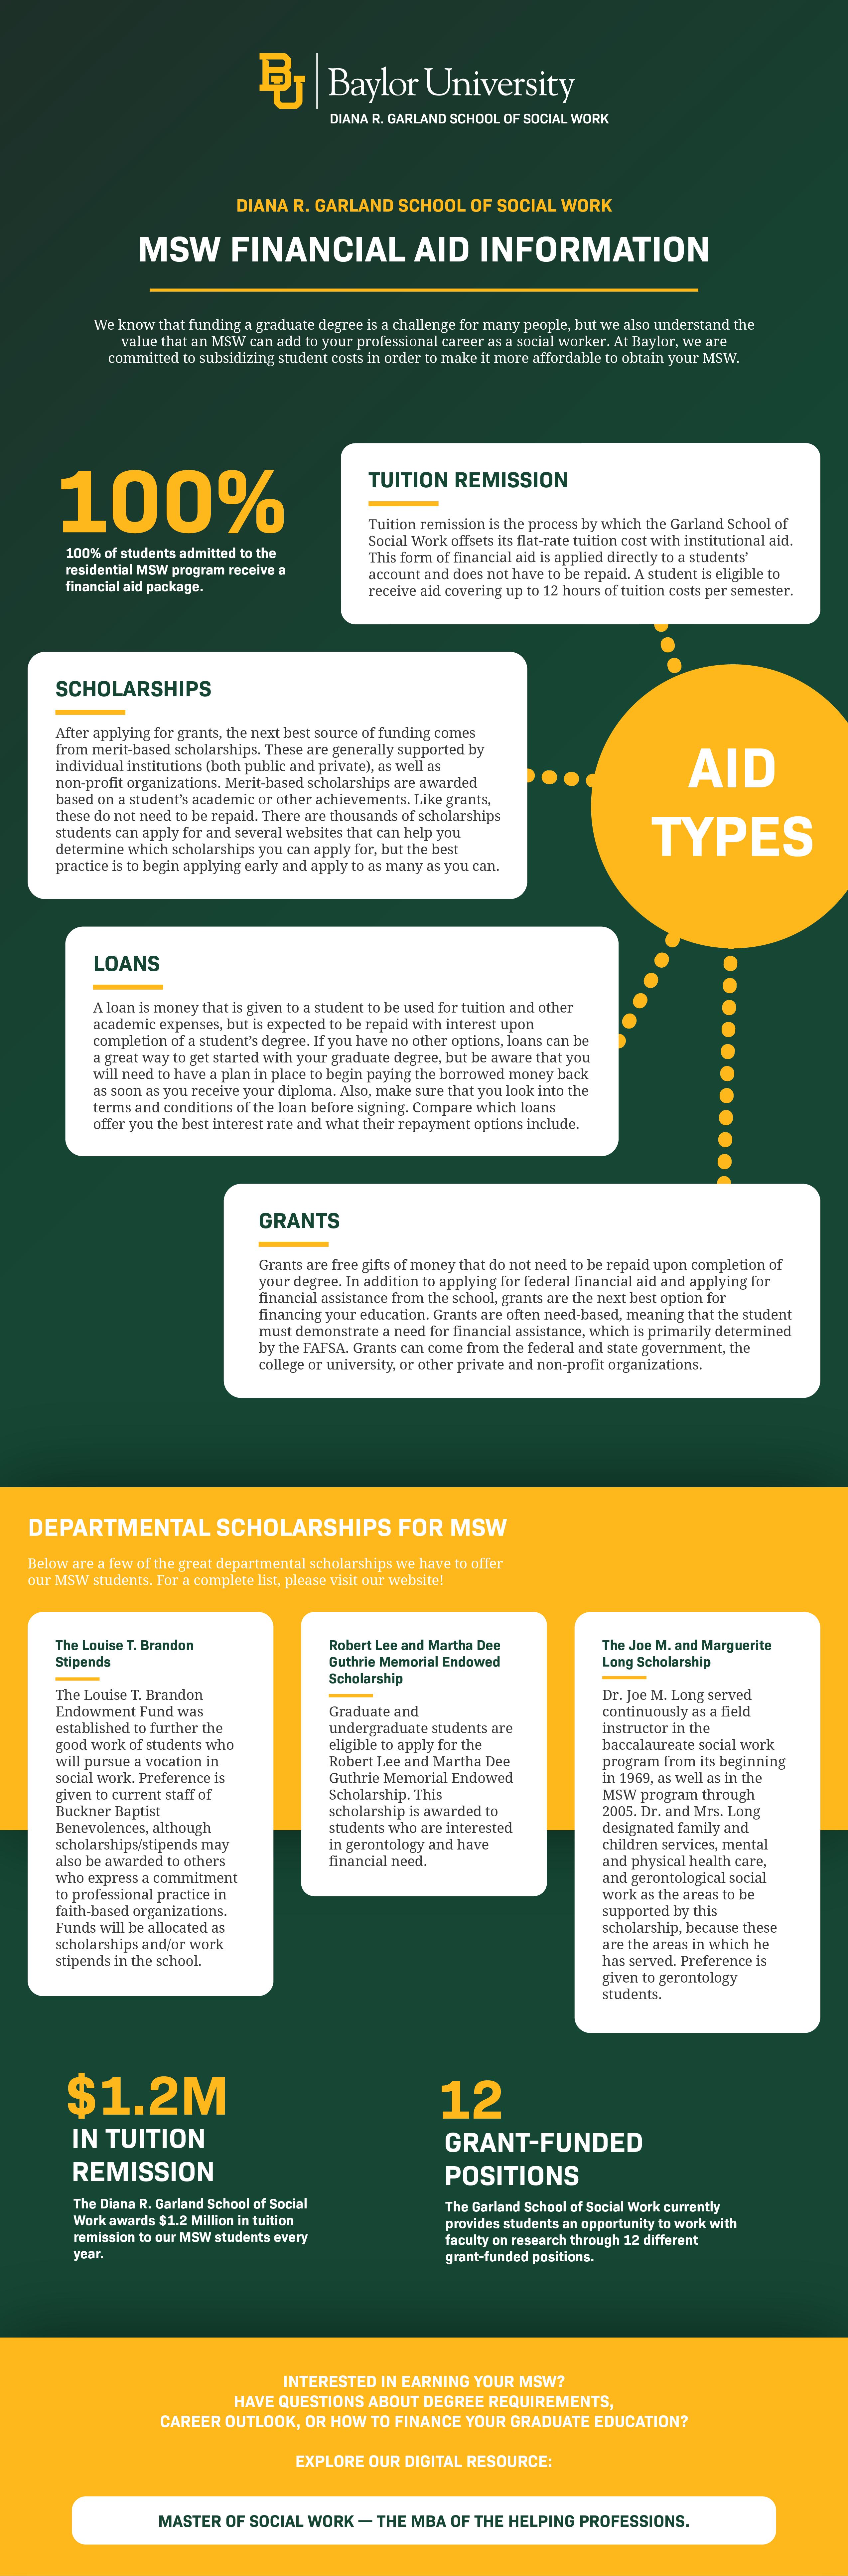 Master-Social-Work-Financial-aid-information-at-baylor-university